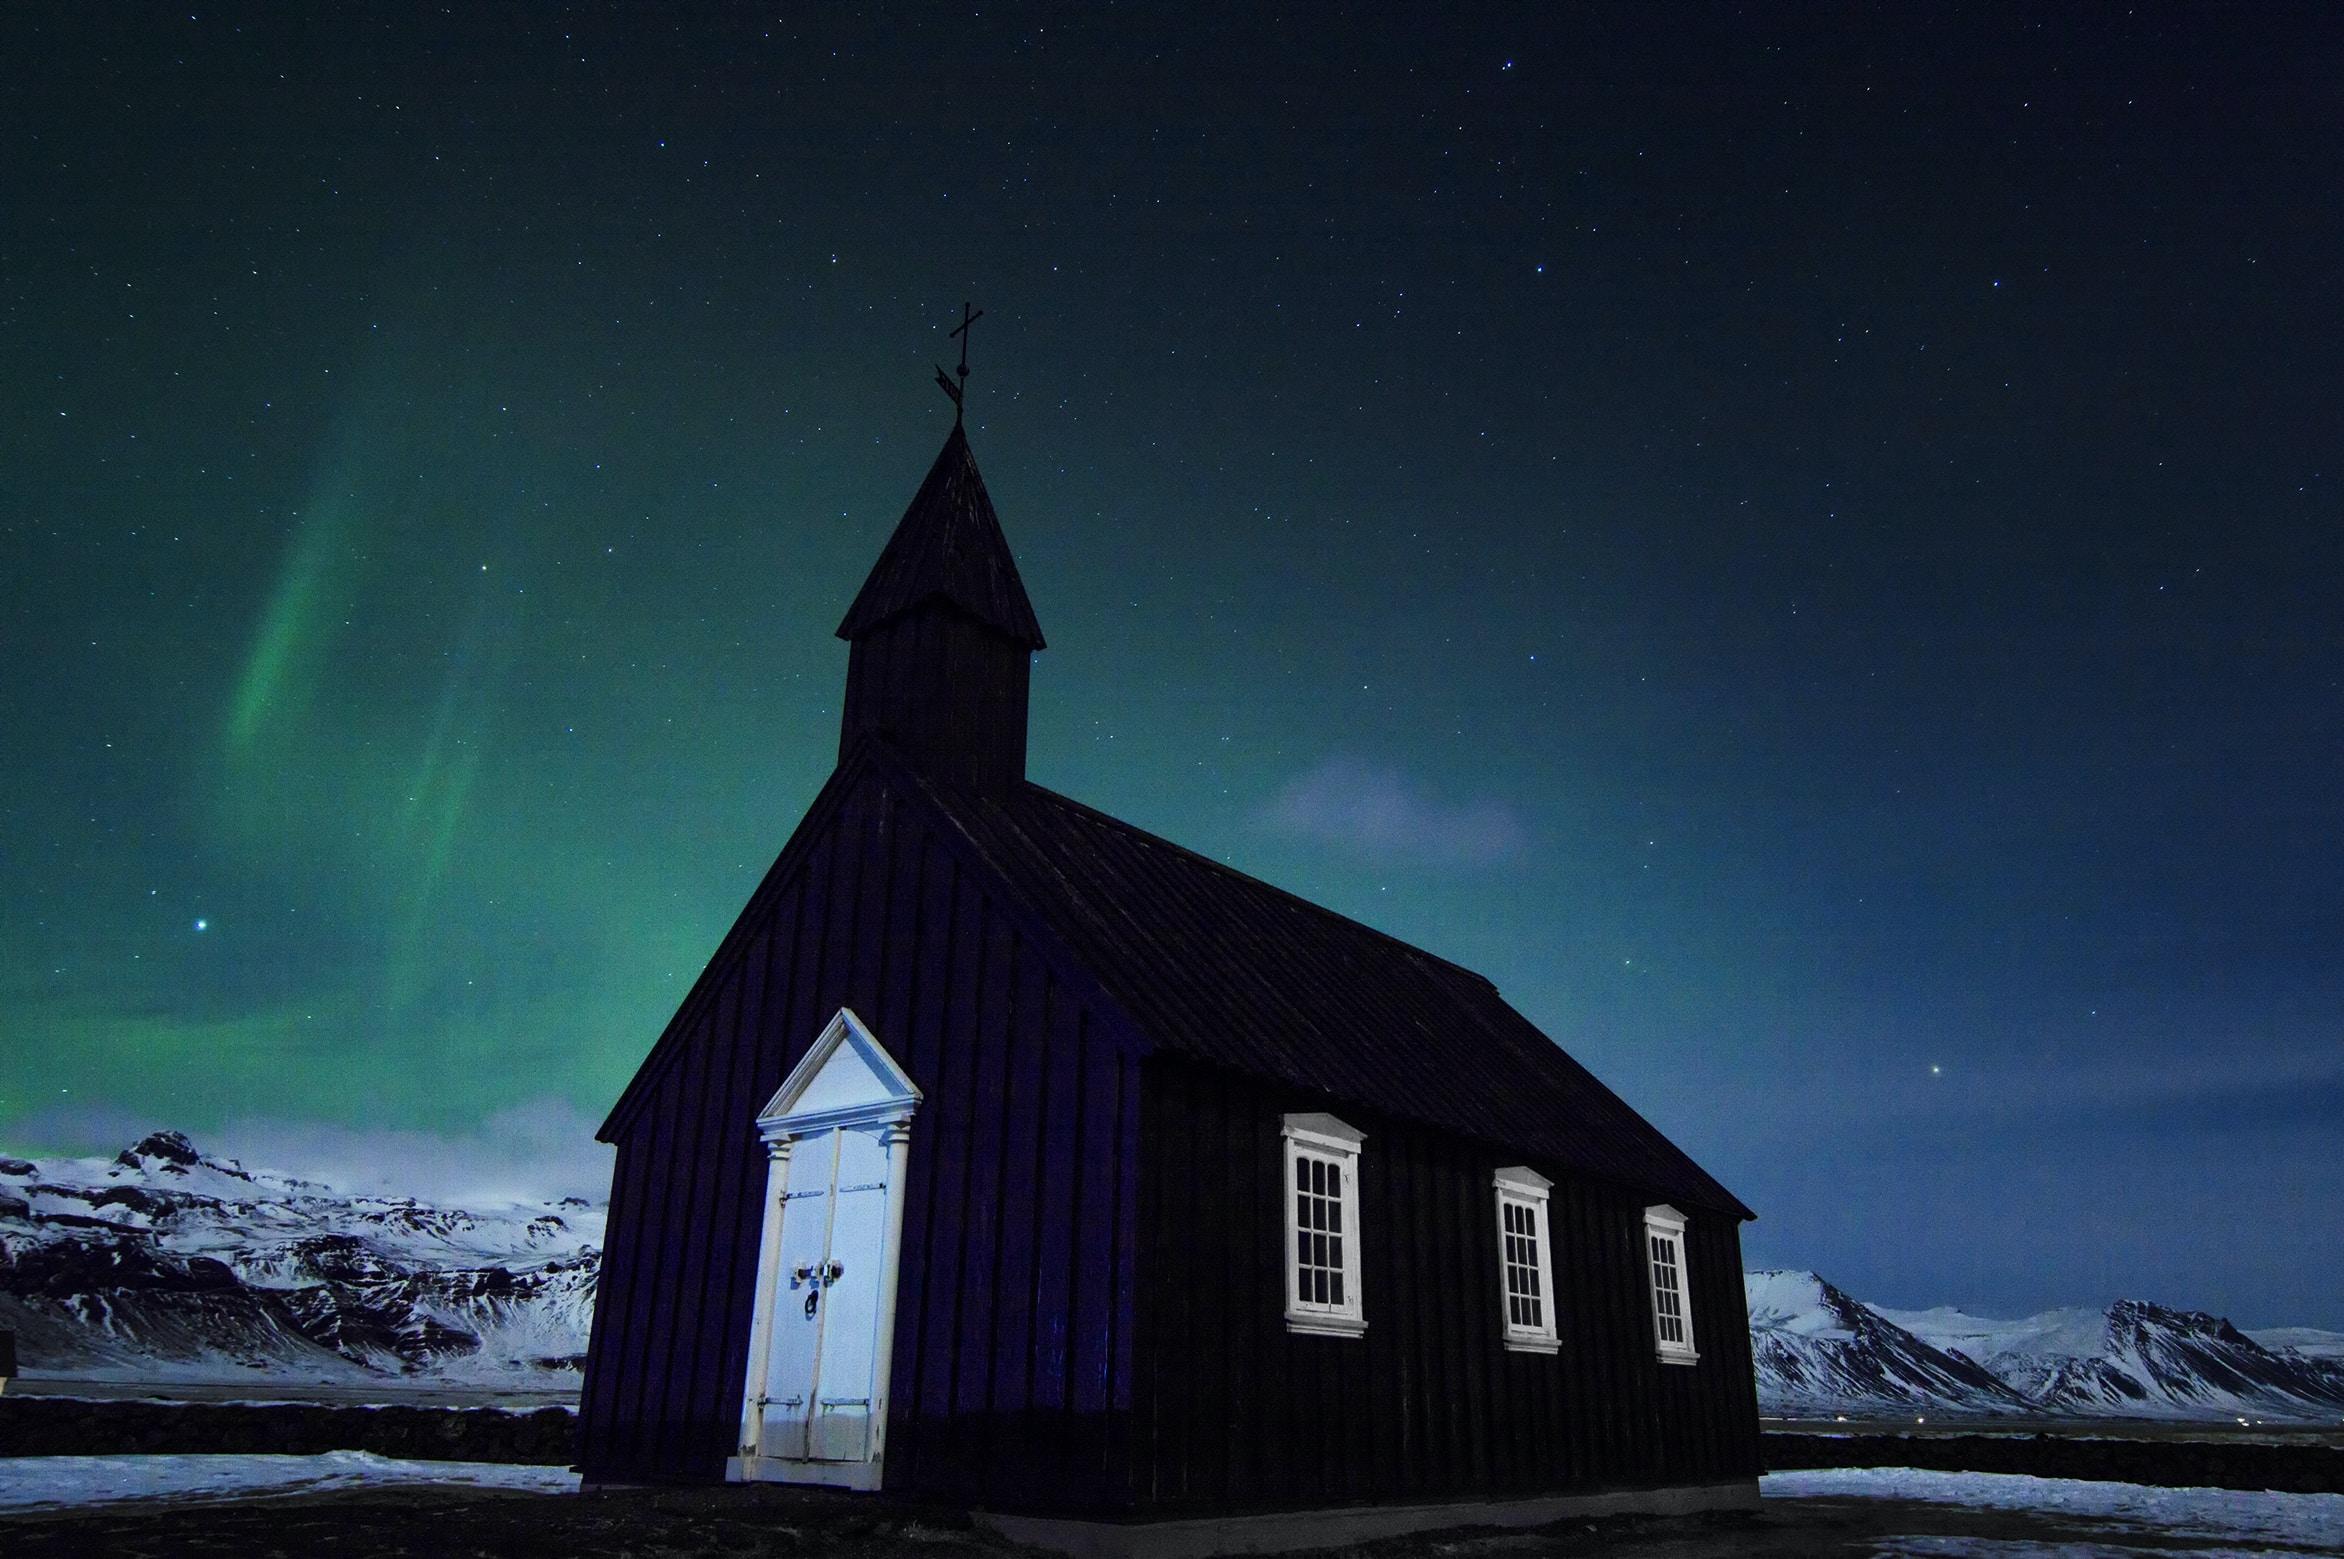 black church under northern lights at nighttime